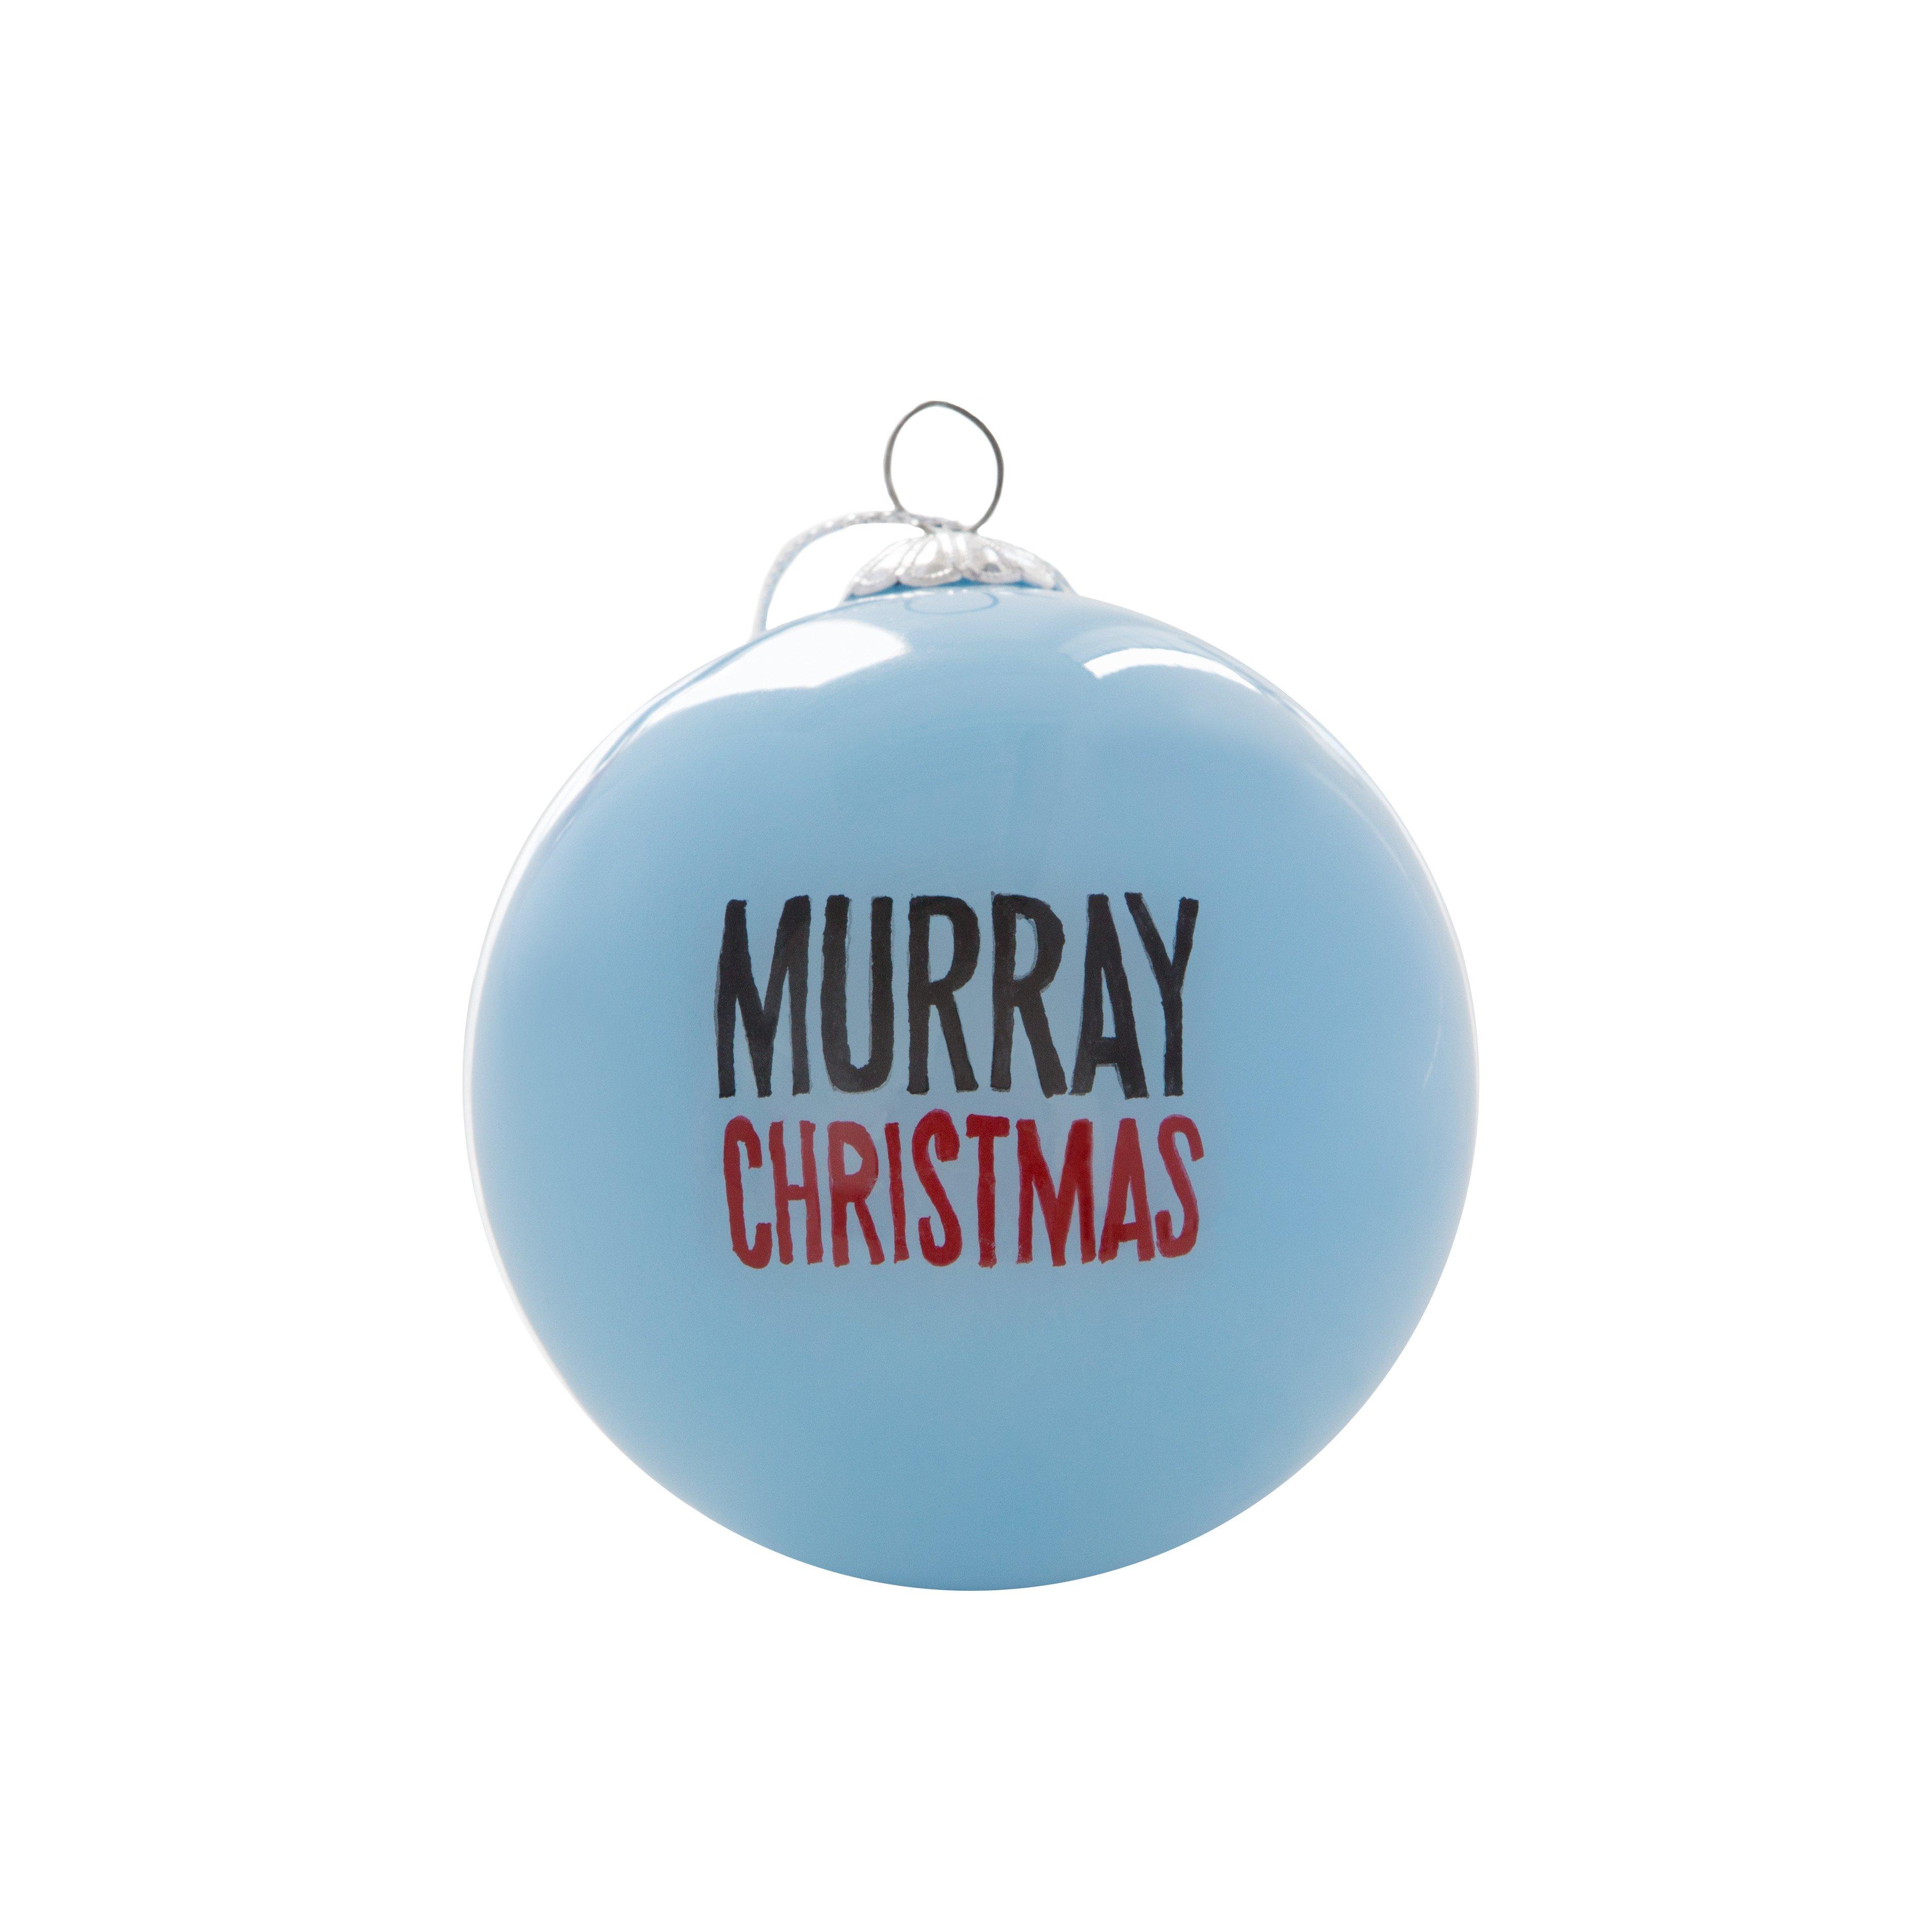 Bill Murray Christmas Bauble - BALTIC Shop